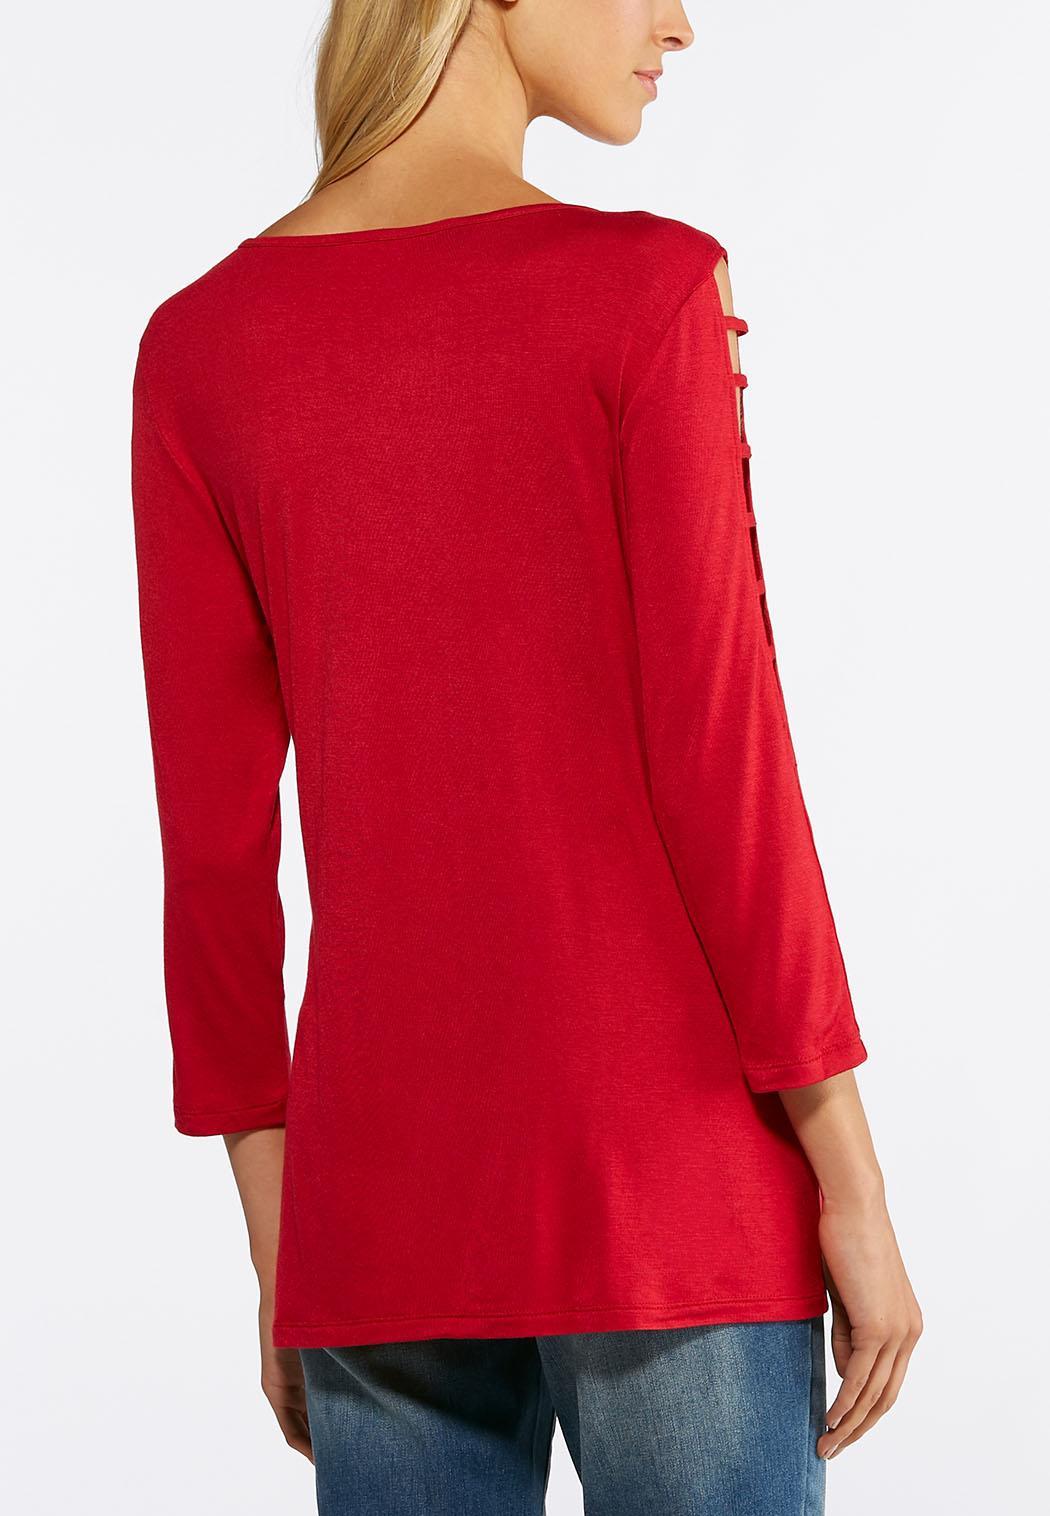 Ladder Sleeve Knit Top (Item #44050232)